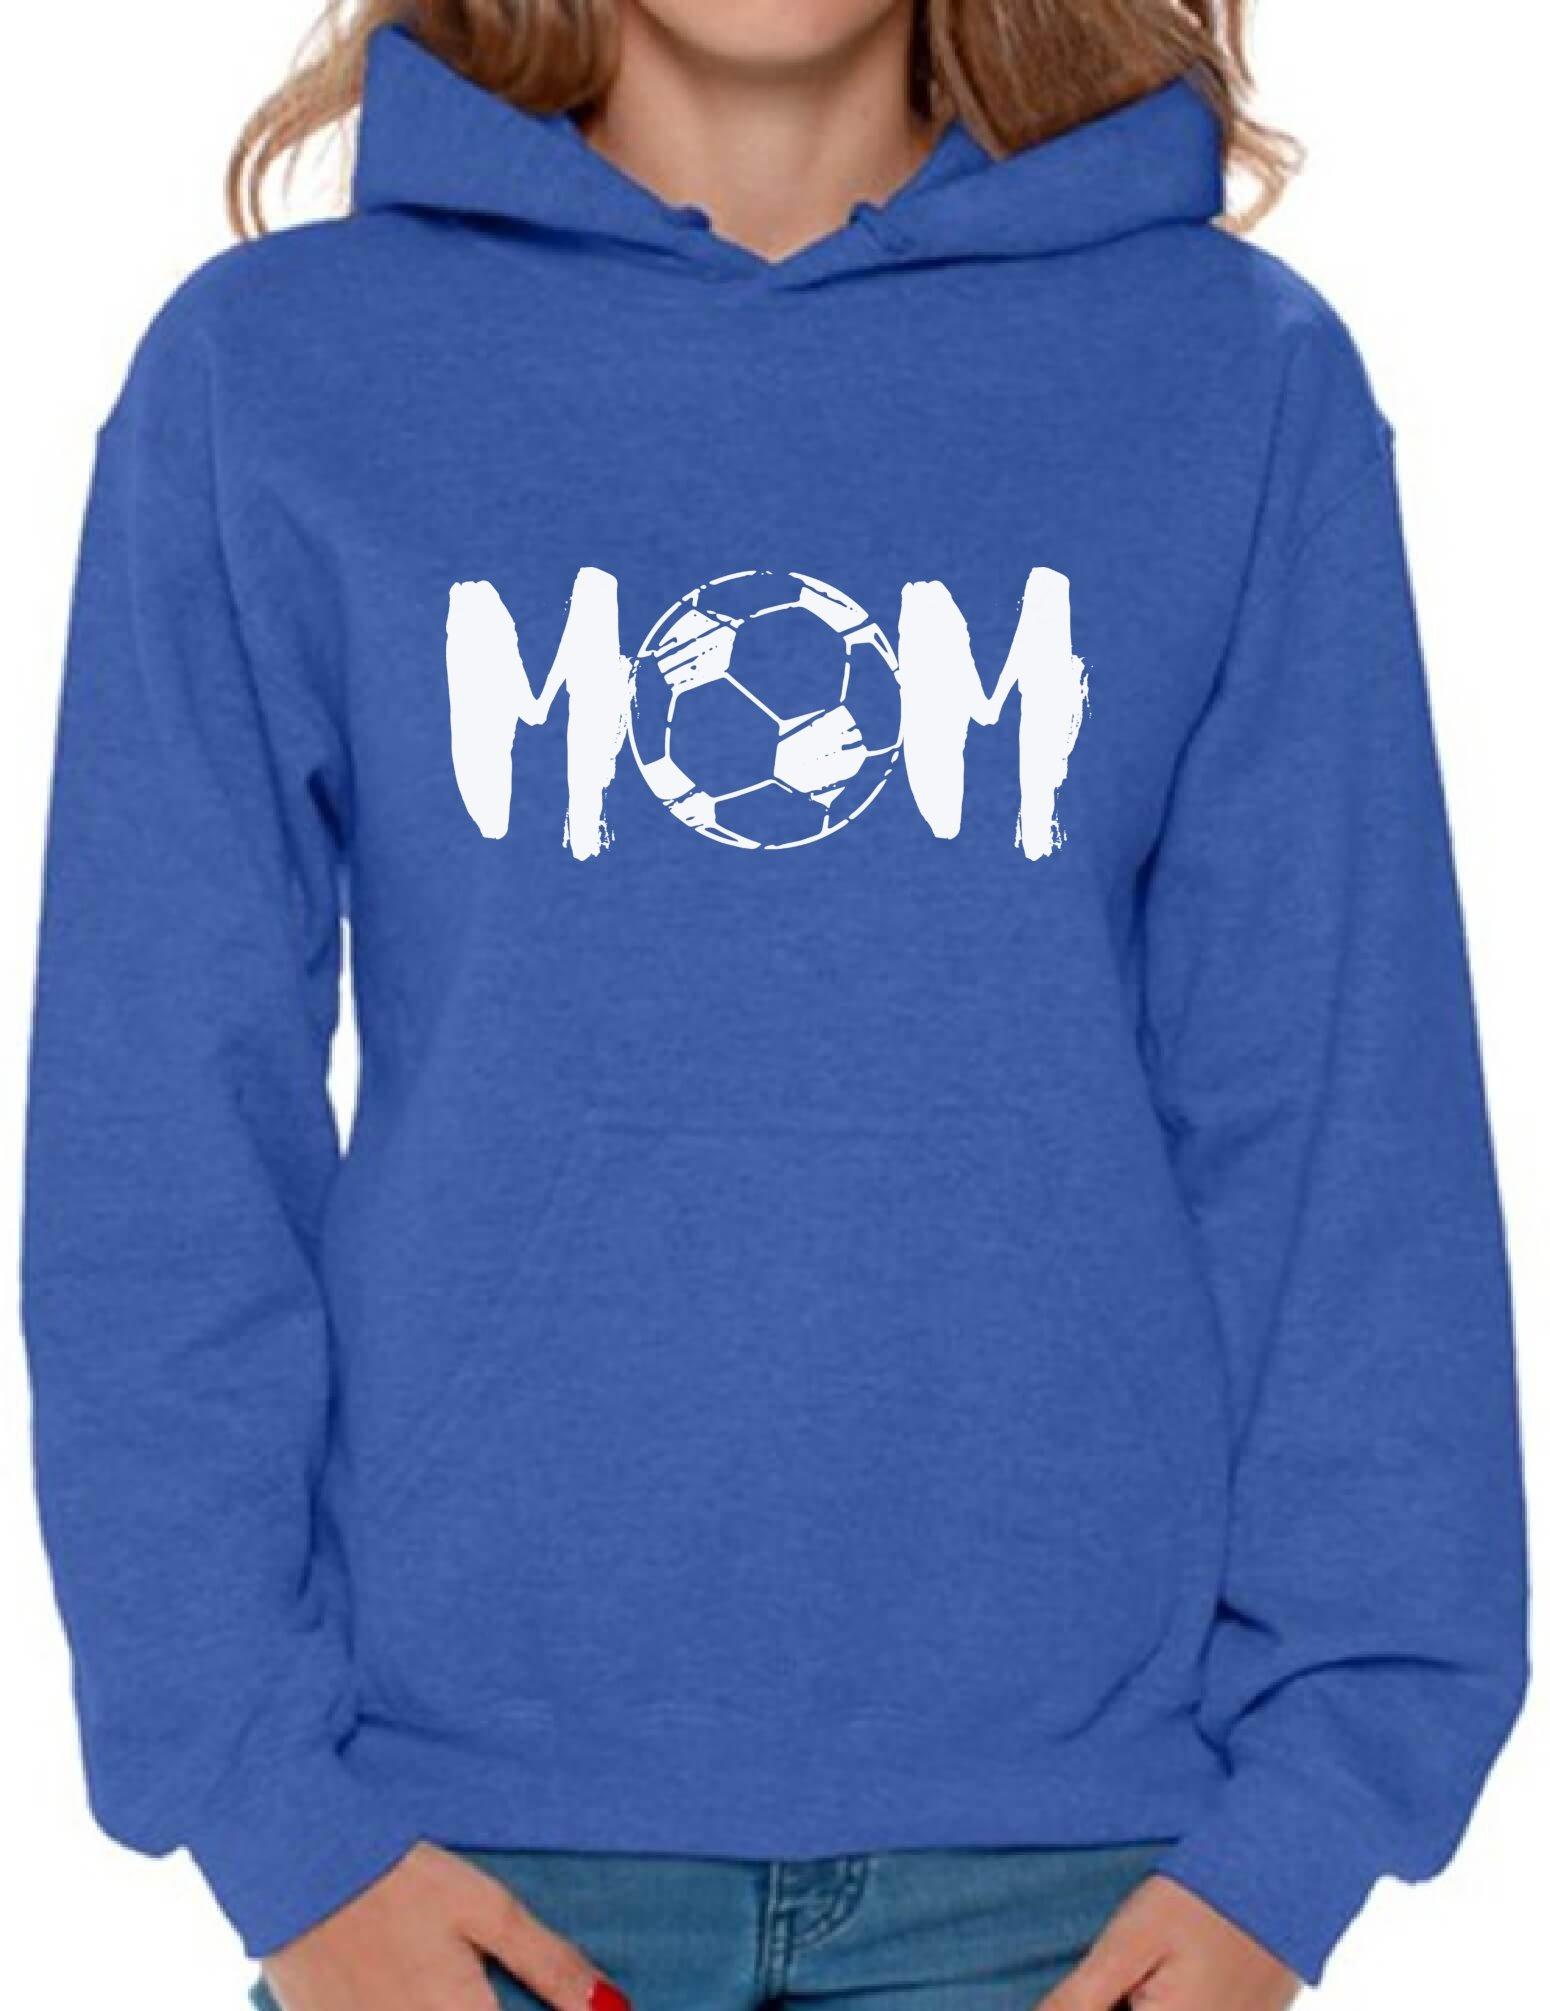 Awkward Styles Women's Soccer Mom Motherhood Graphic Hoodie Tops White Sport Mom Gift Idea Blue M